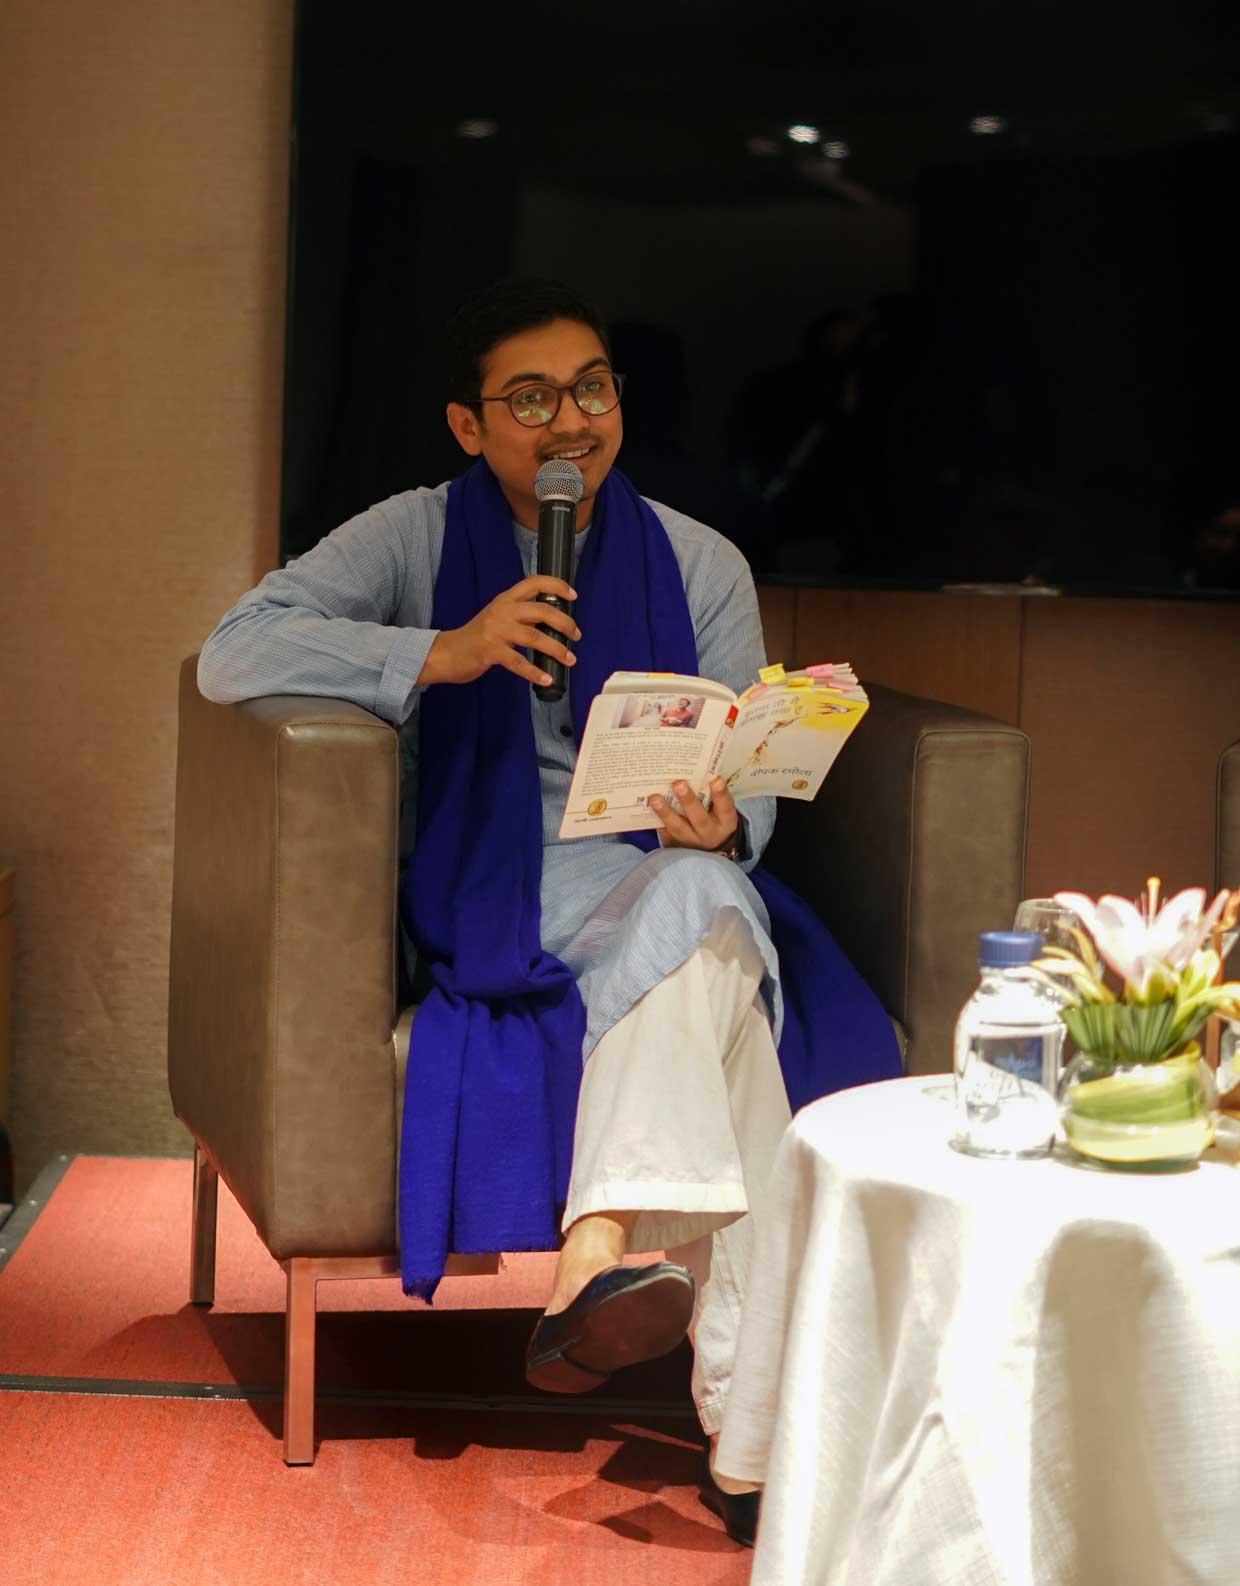 Deepak-Ramola-Author